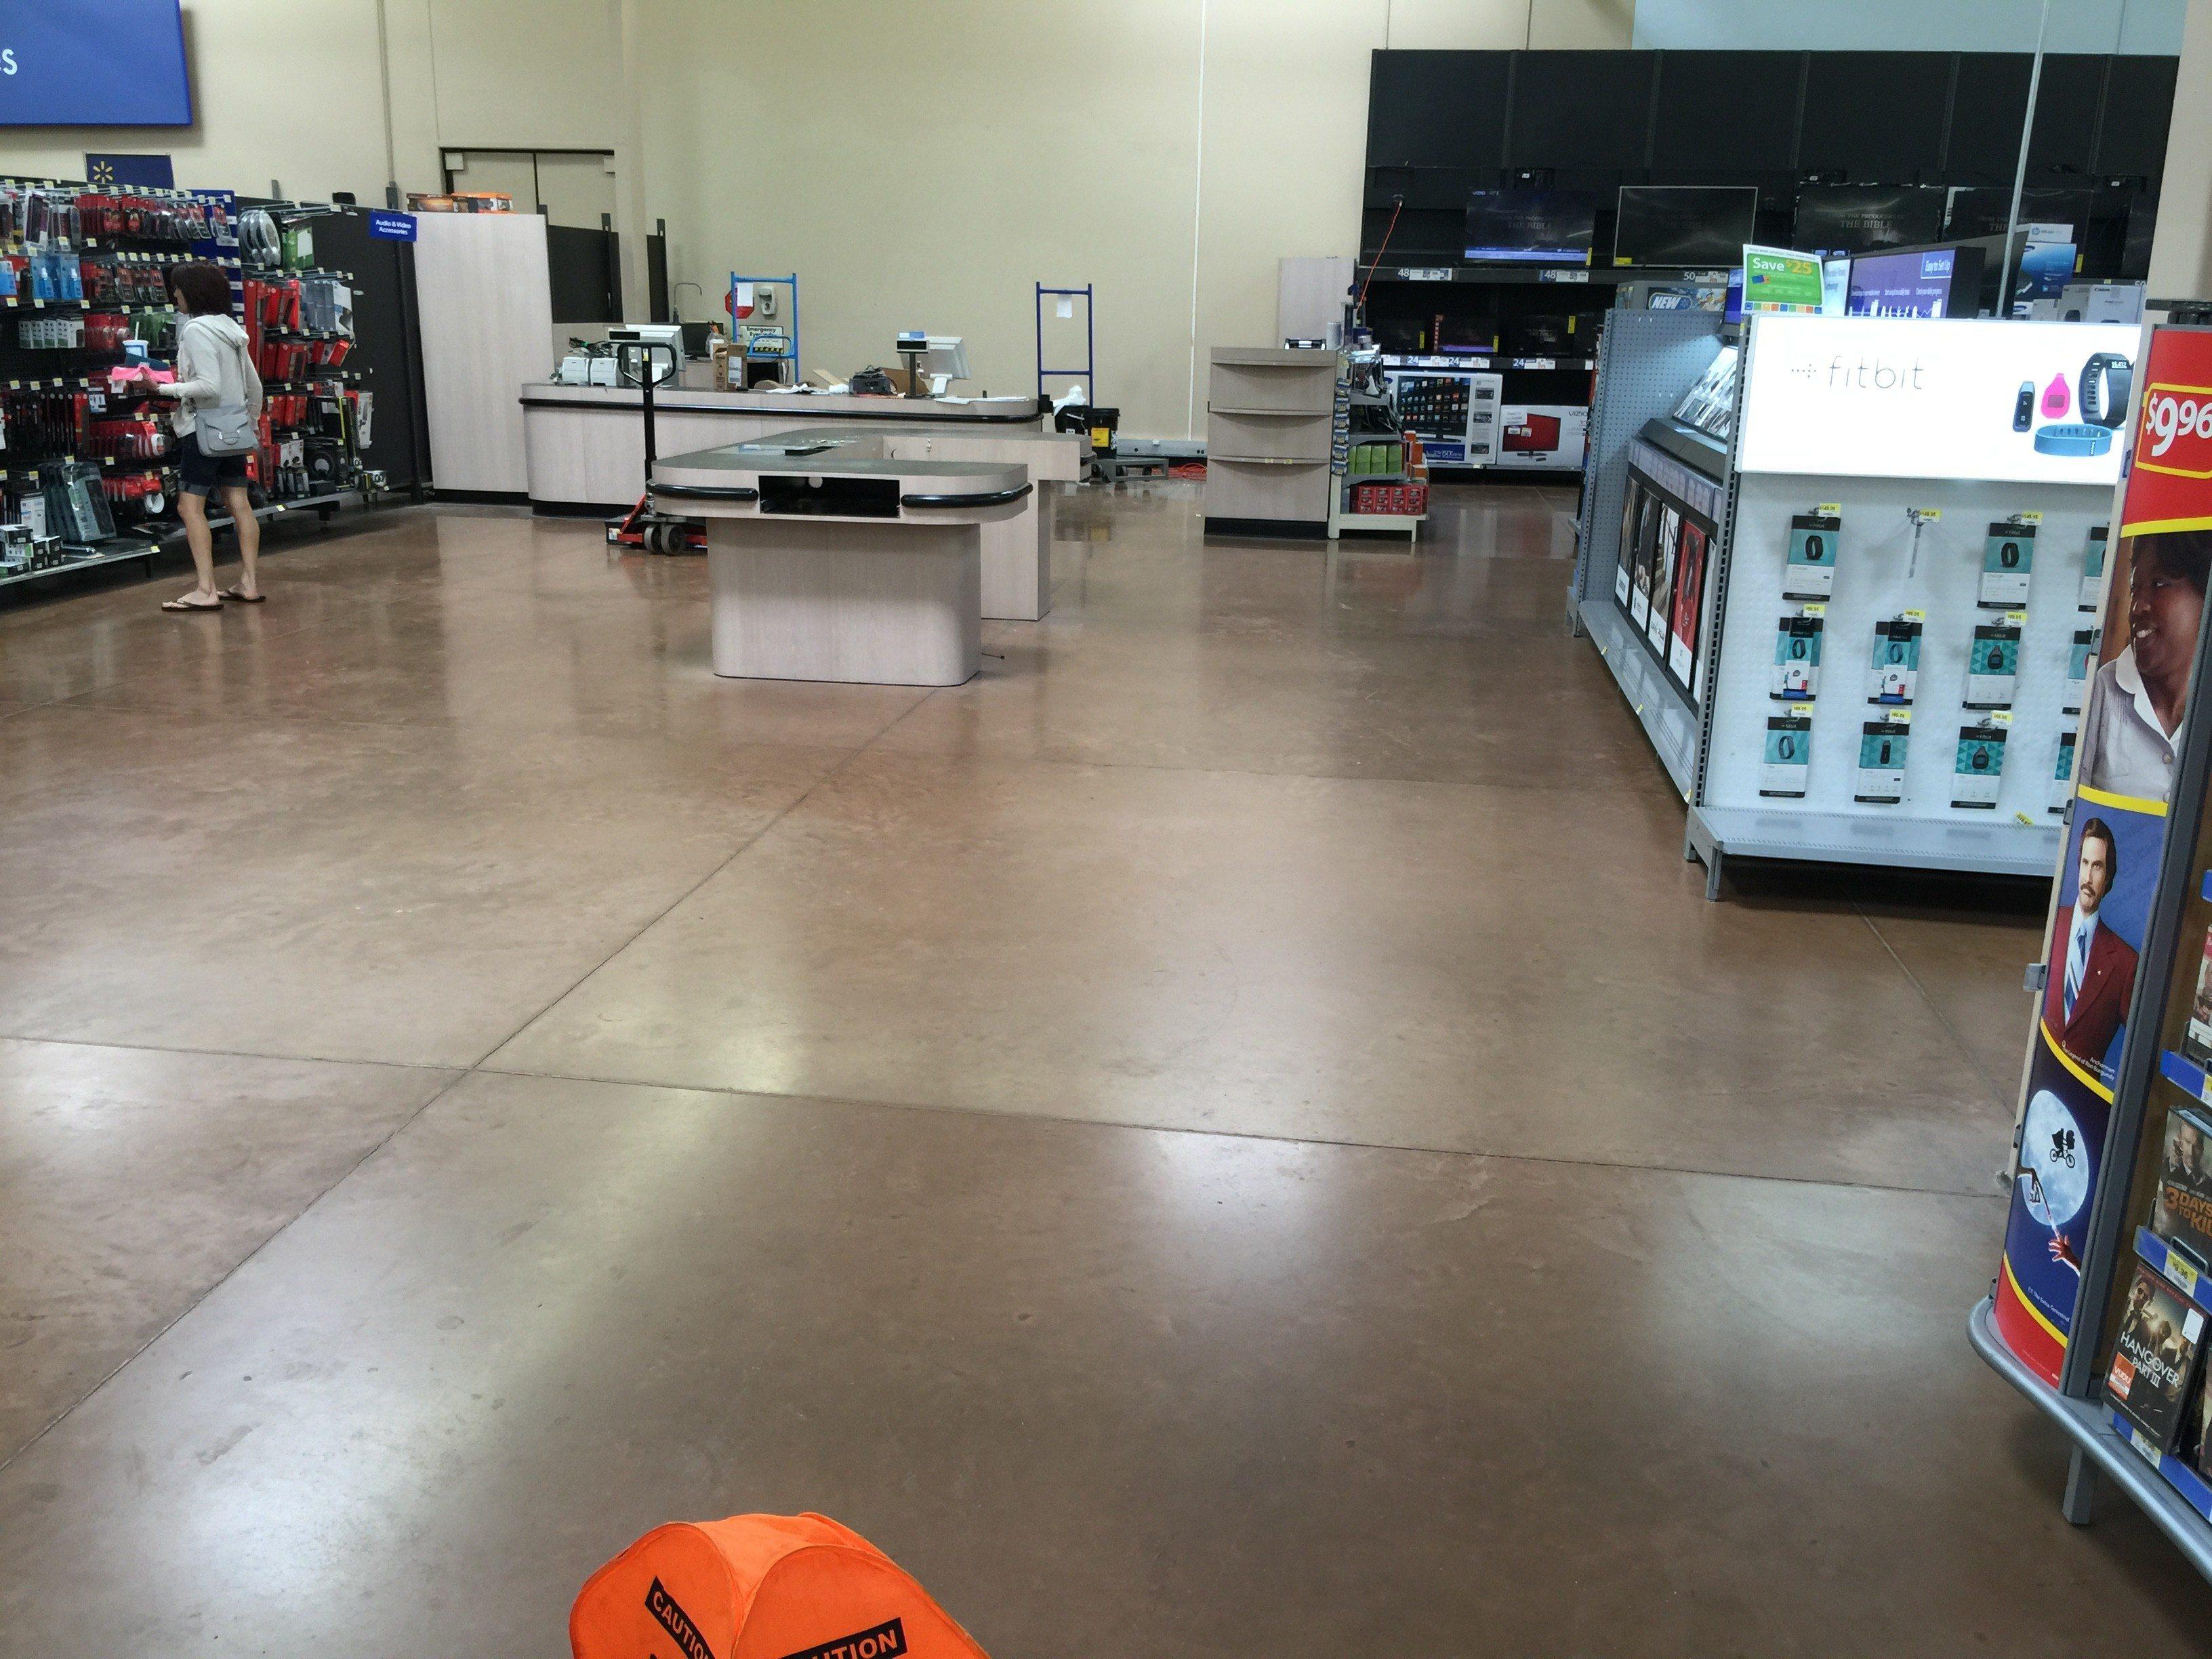 Walmart Photo printing kiosk